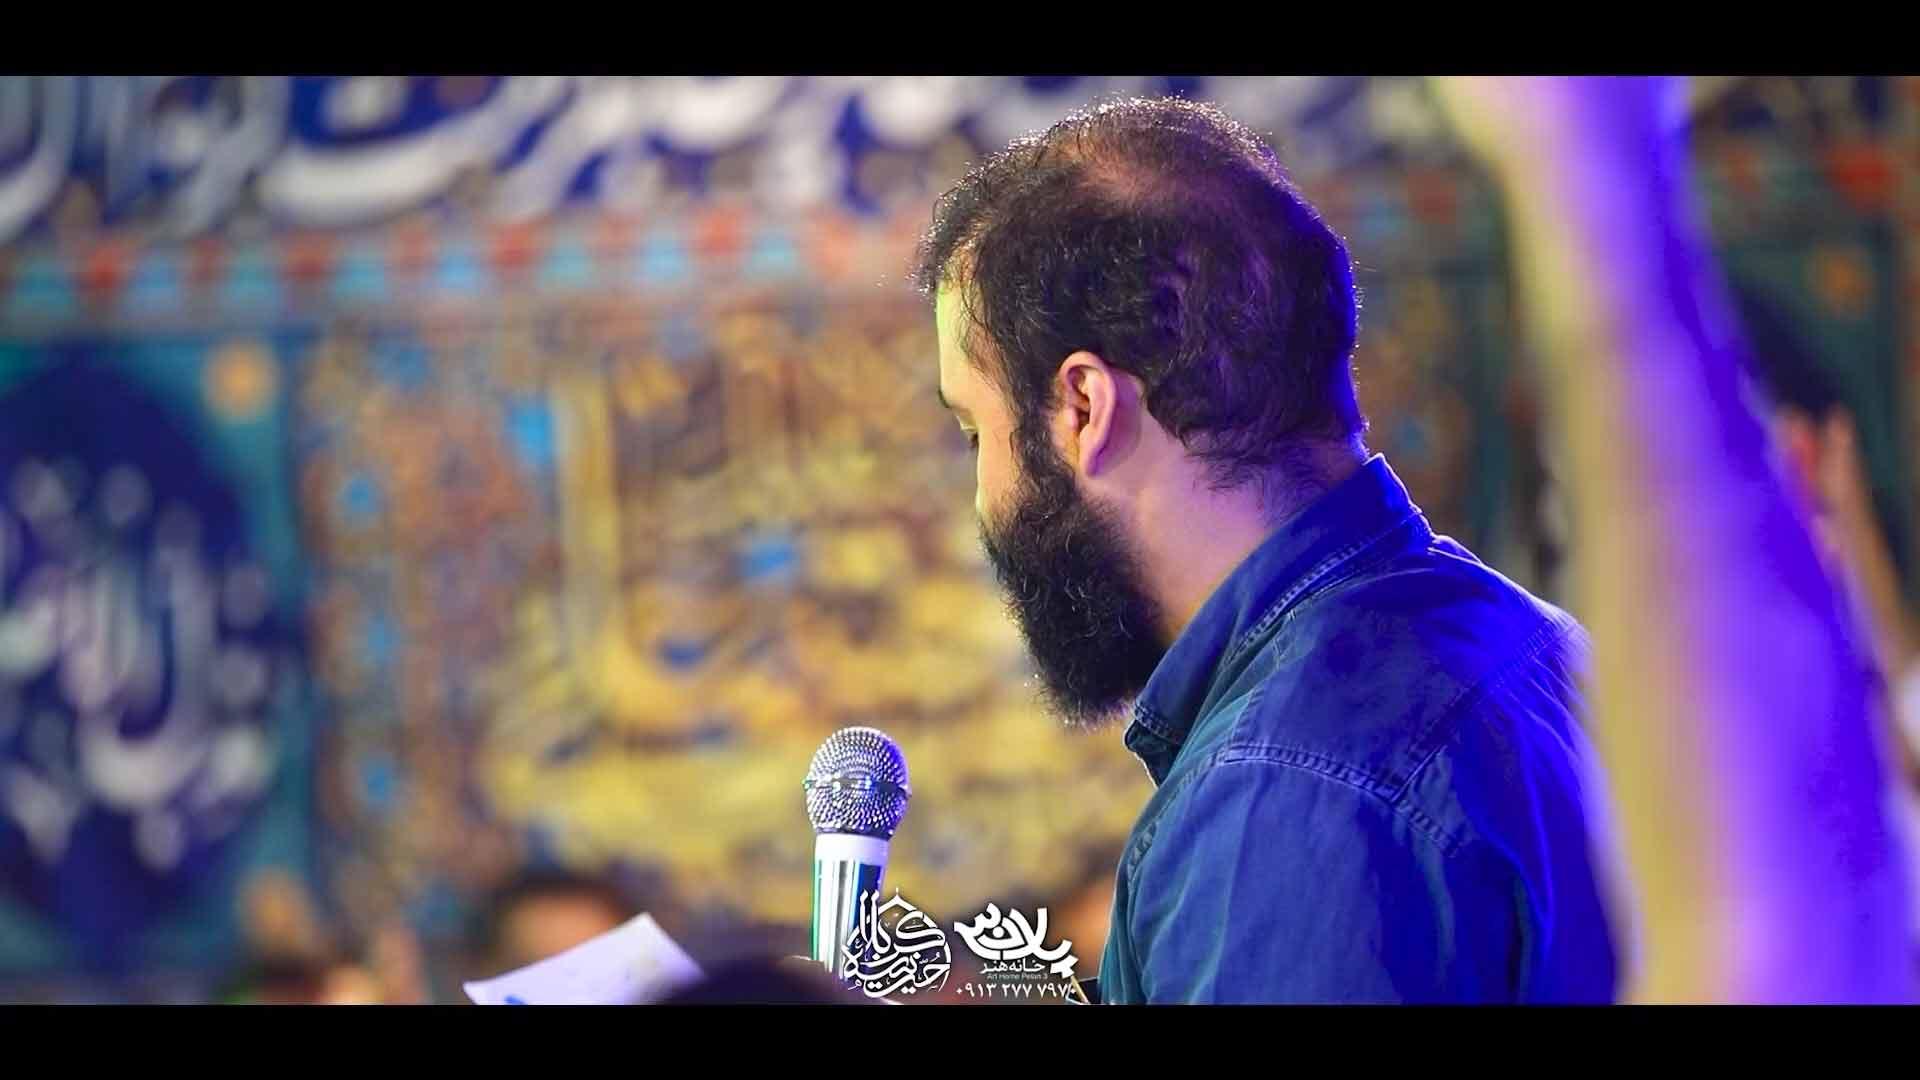 سفره دار خونه حیدر عبدالرضا هلالی